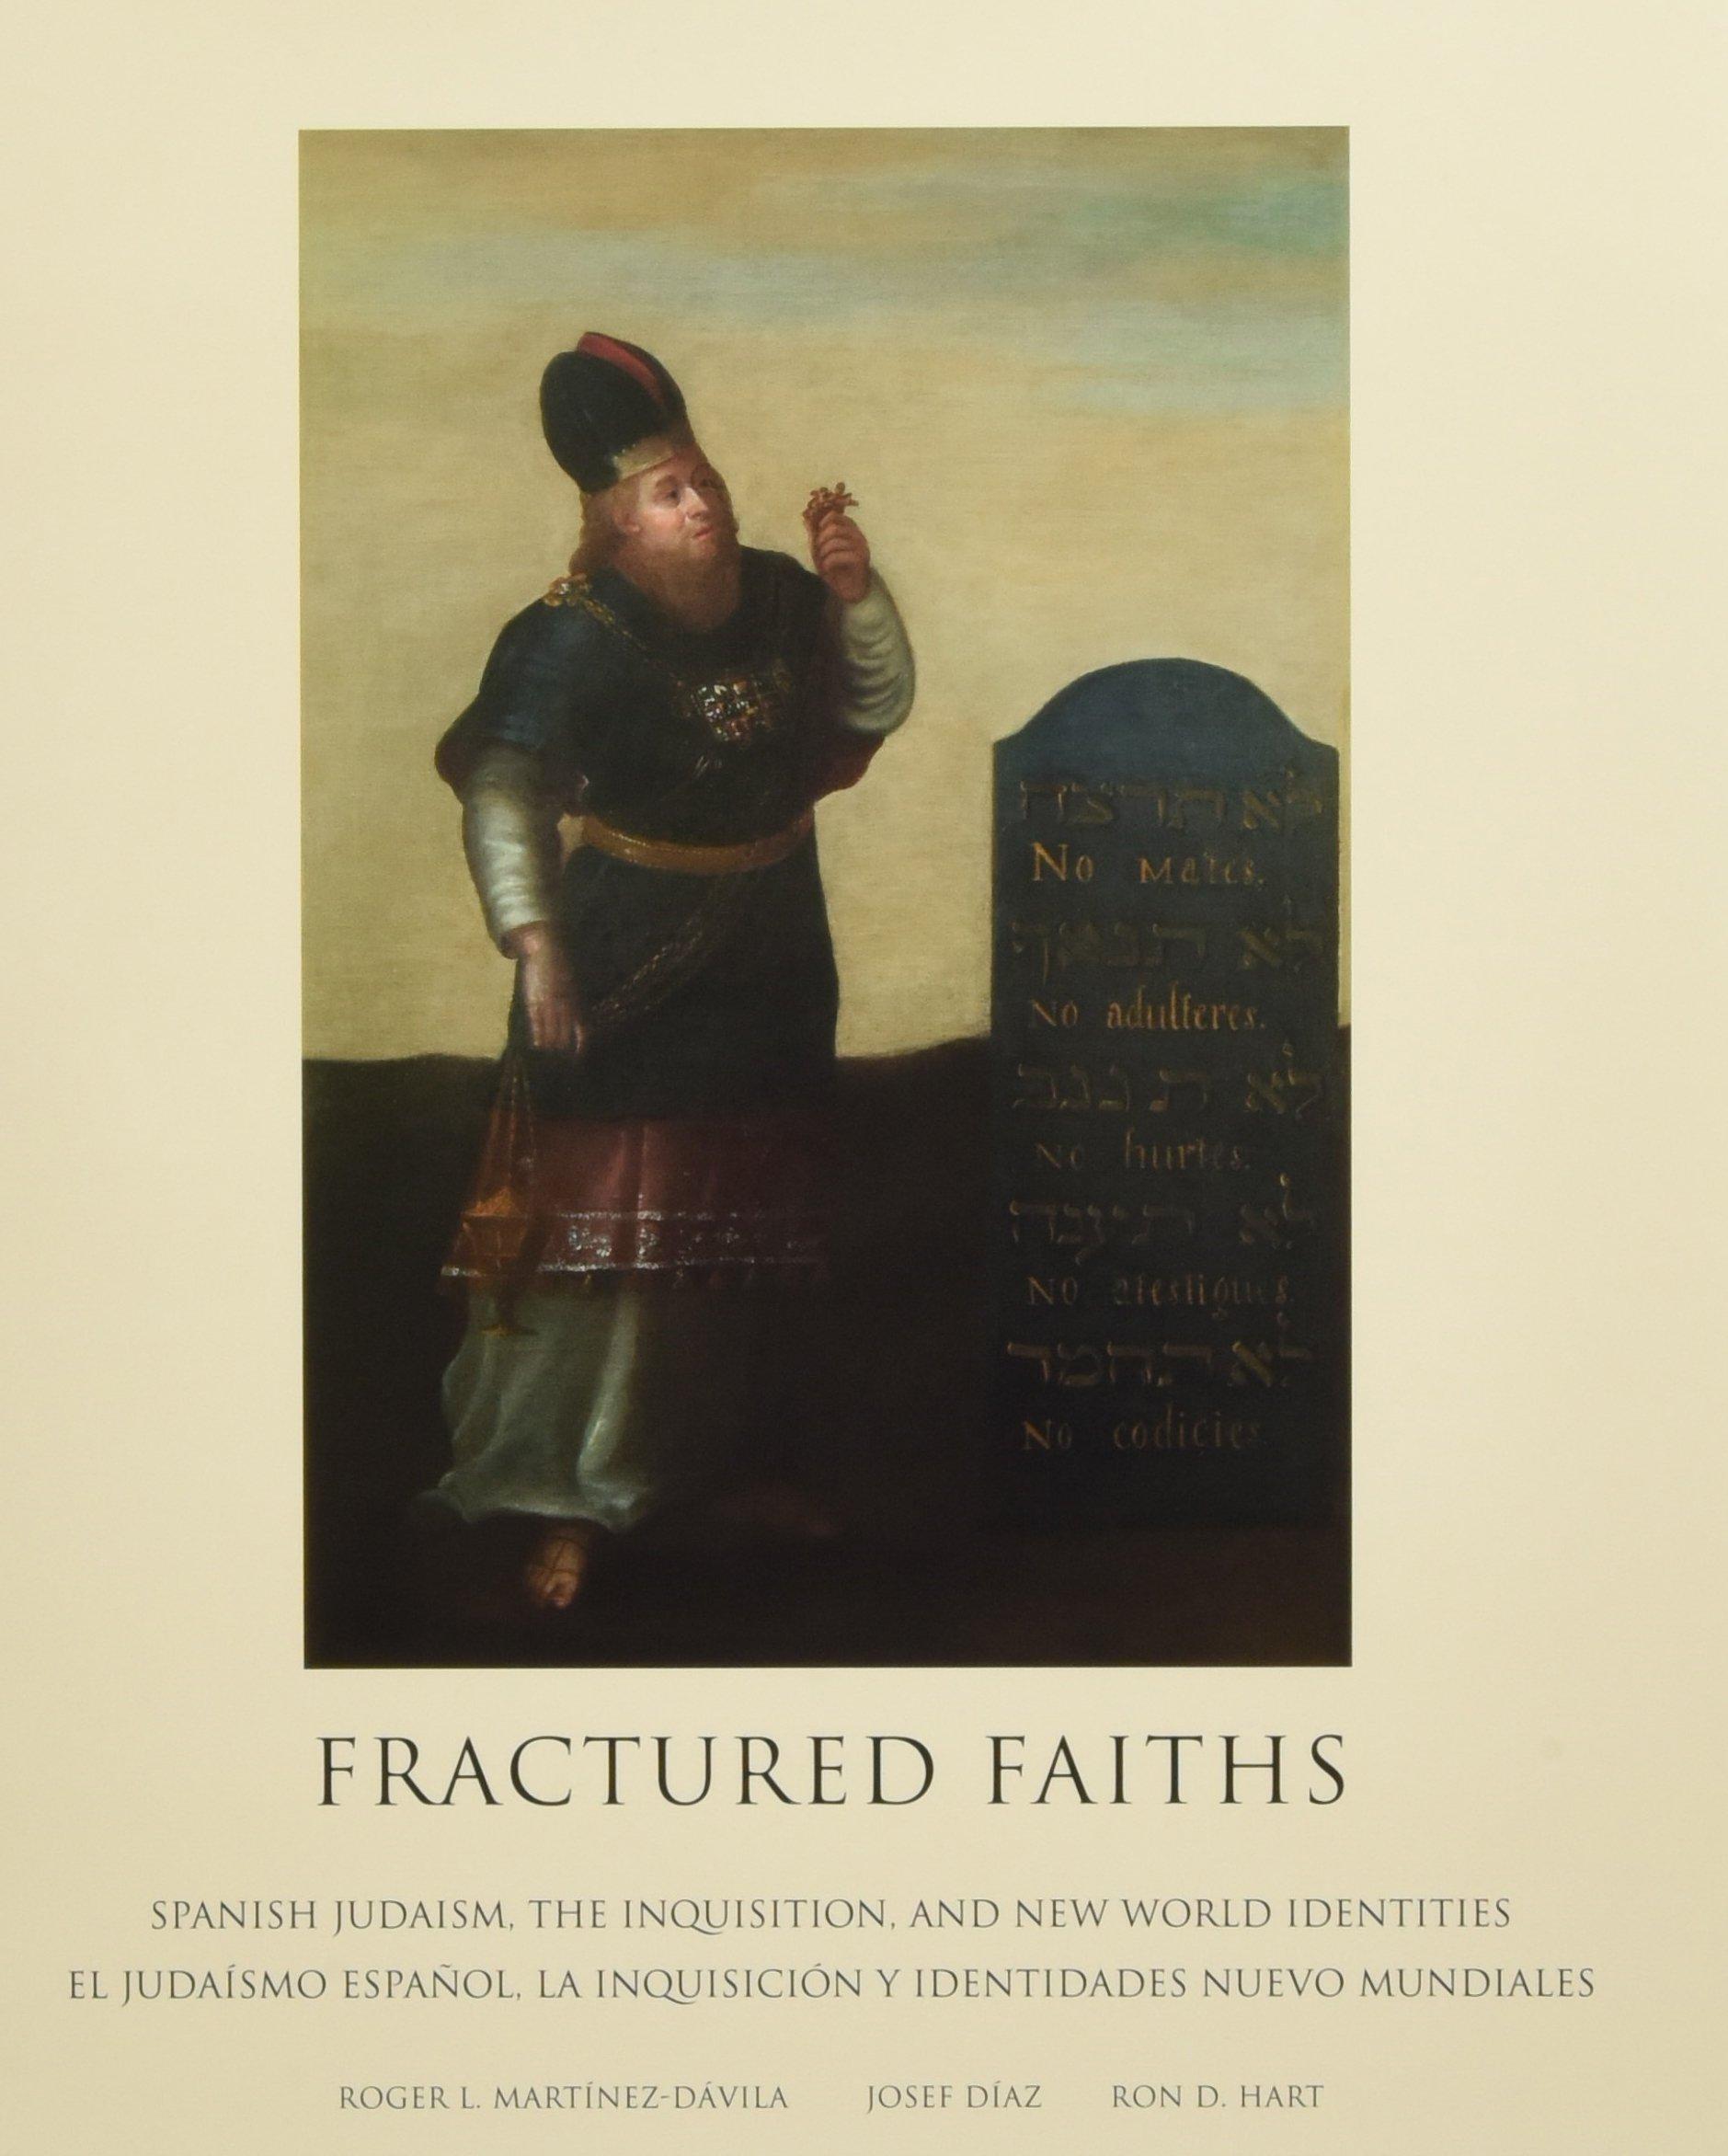 Download Fractured Faiths / Las fes fracturadas: Spanish Judaism, the Inquisition, and New World Identities / El judaísmo español, la Inquisición y identidades nuevo mundiales (English and Spanish Edition) pdf epub